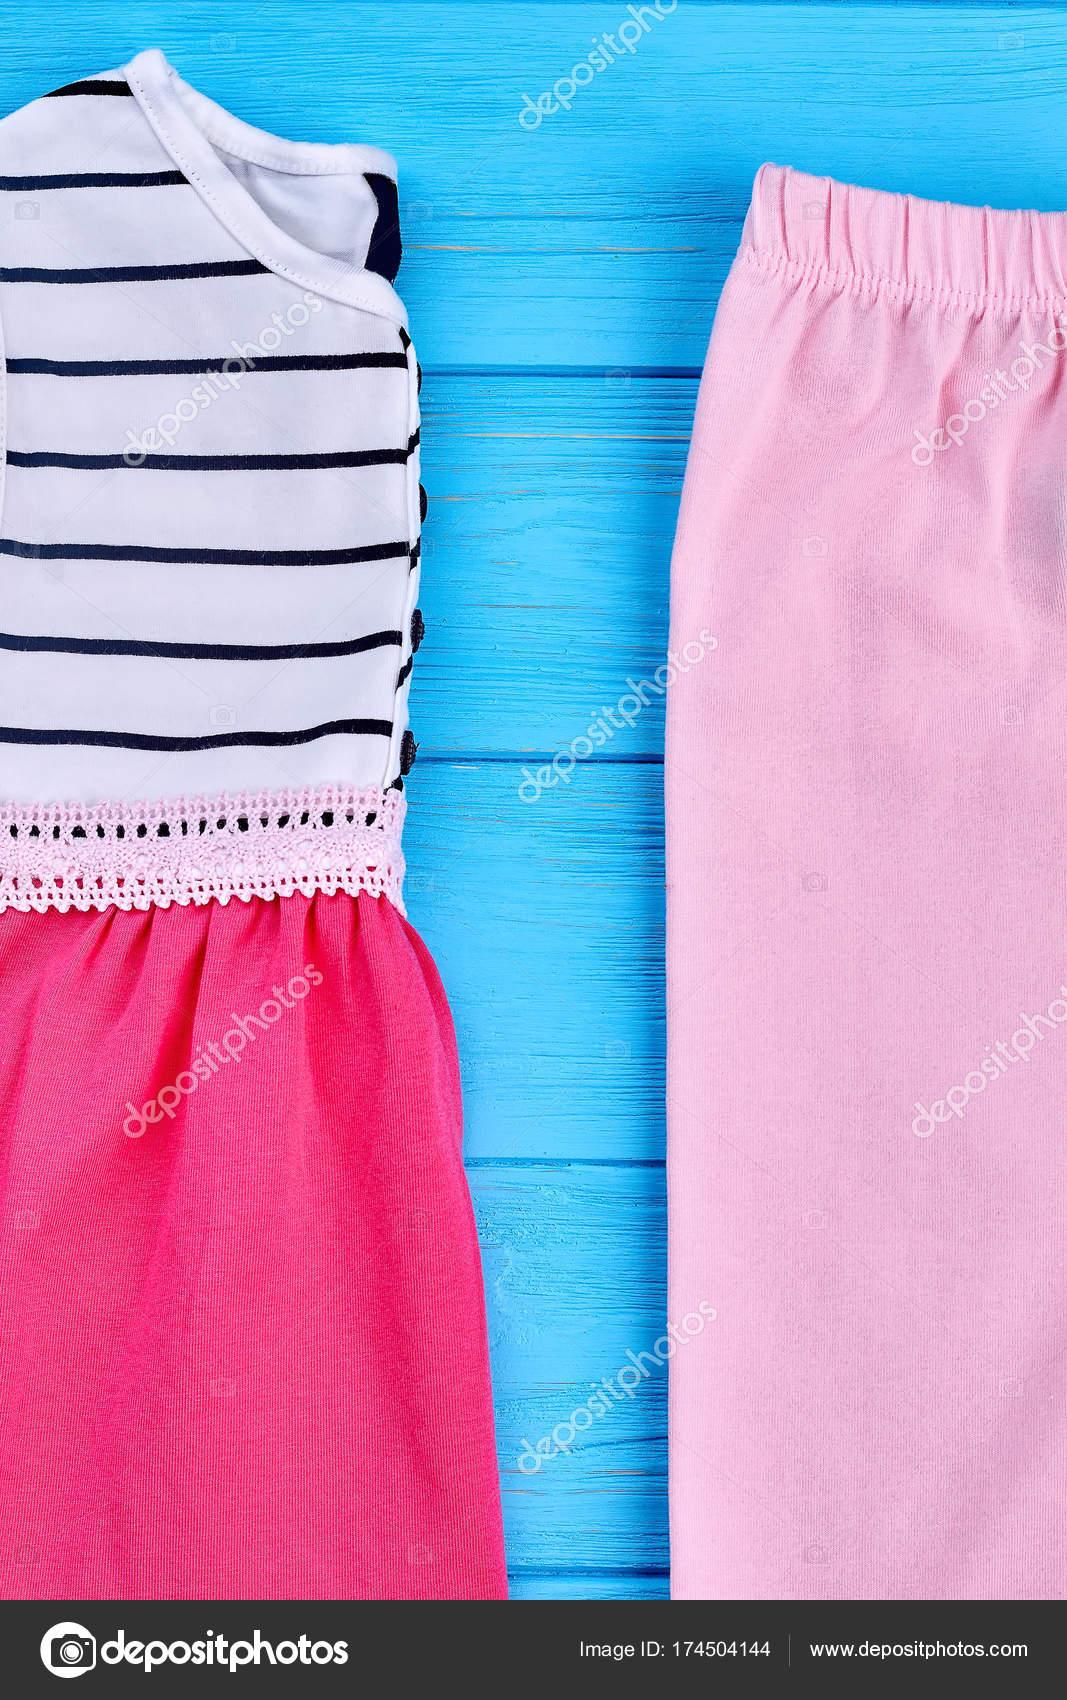 c035d248620 Υψηλής ποιότητας μάρκα παιδικά ρούχα. Παιδικά βιολογικά είδη ένδυσης για  καλοκαιρινά ενδύματα. Ένδυμα καλοκαίρι childs — Εικόνα από ...